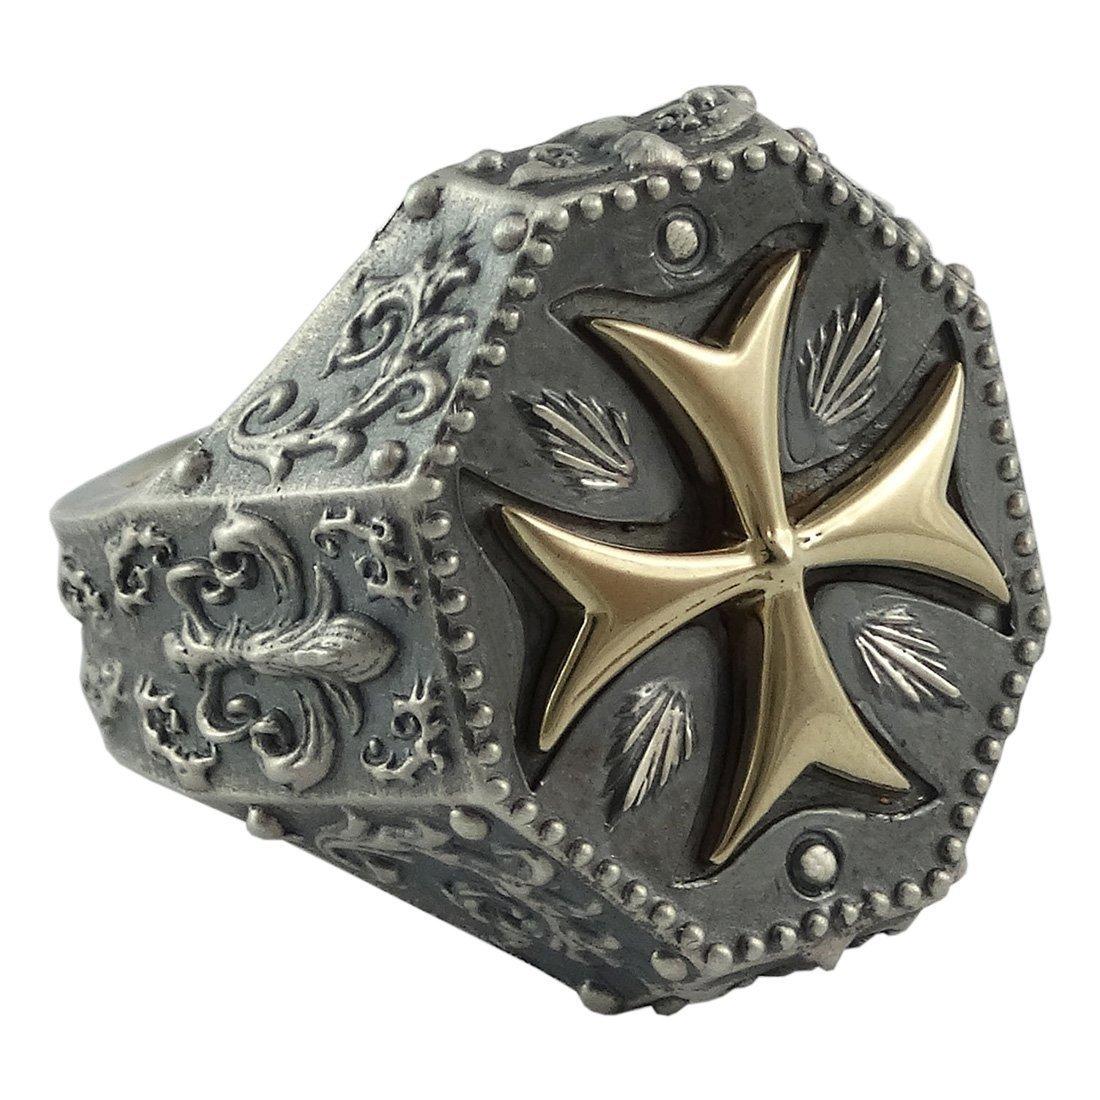 Knights Templar Maltese Cross Mens Ring Fleur De Lis Silver 925 and 10K Gold Masonic Jewelry